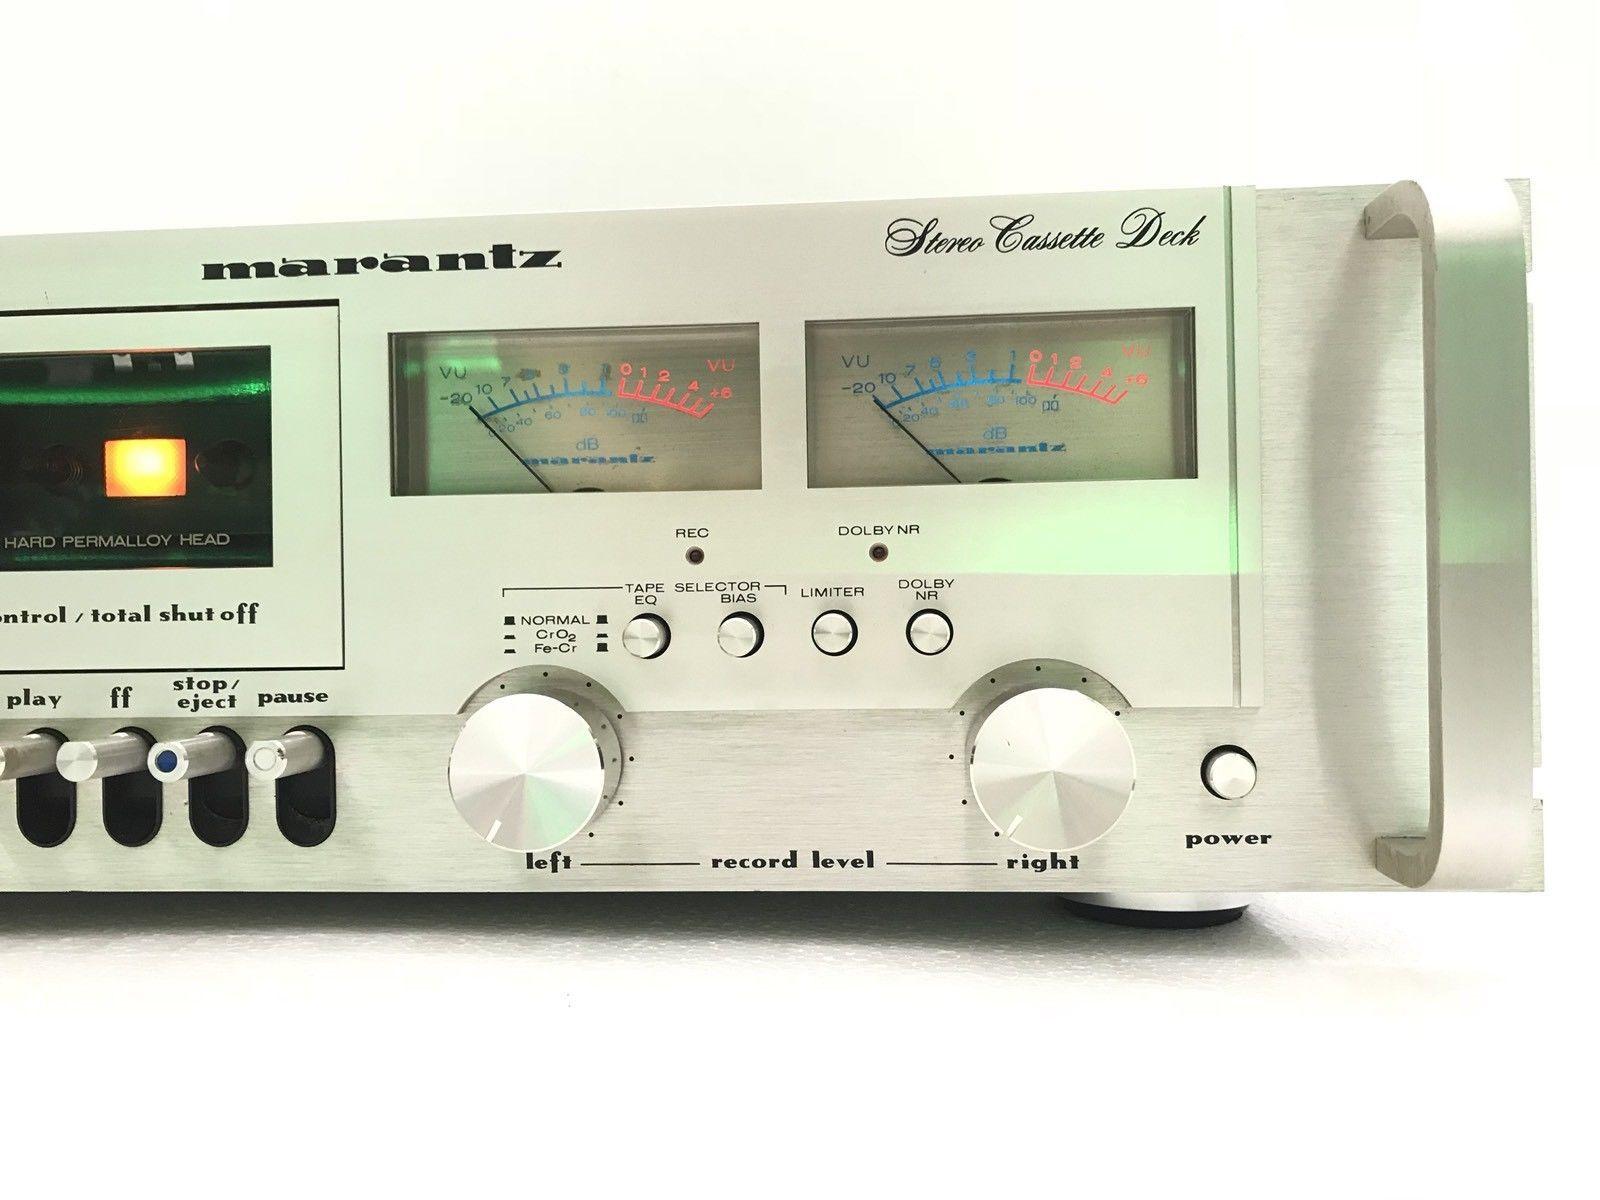 MARANTZ 5010B Stereo Cassette Deck Rare Original Rack